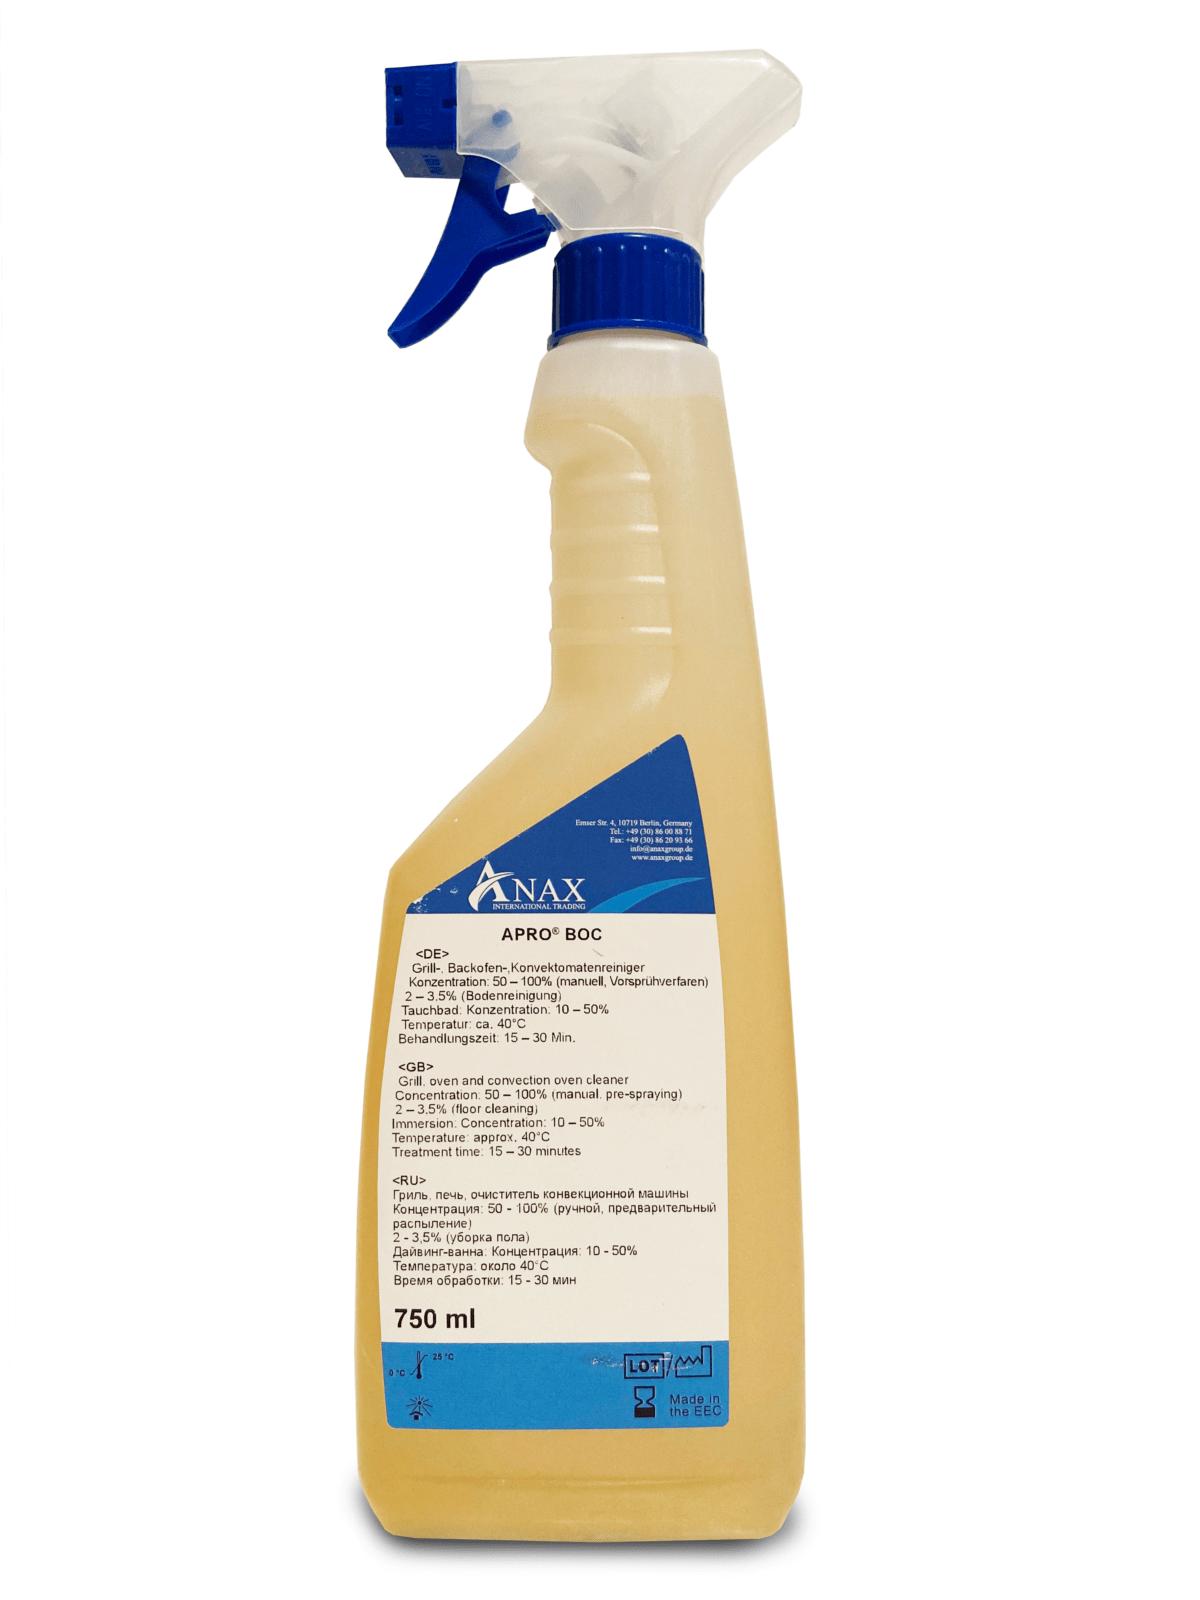 Моющее средство APRO GLR ANAX